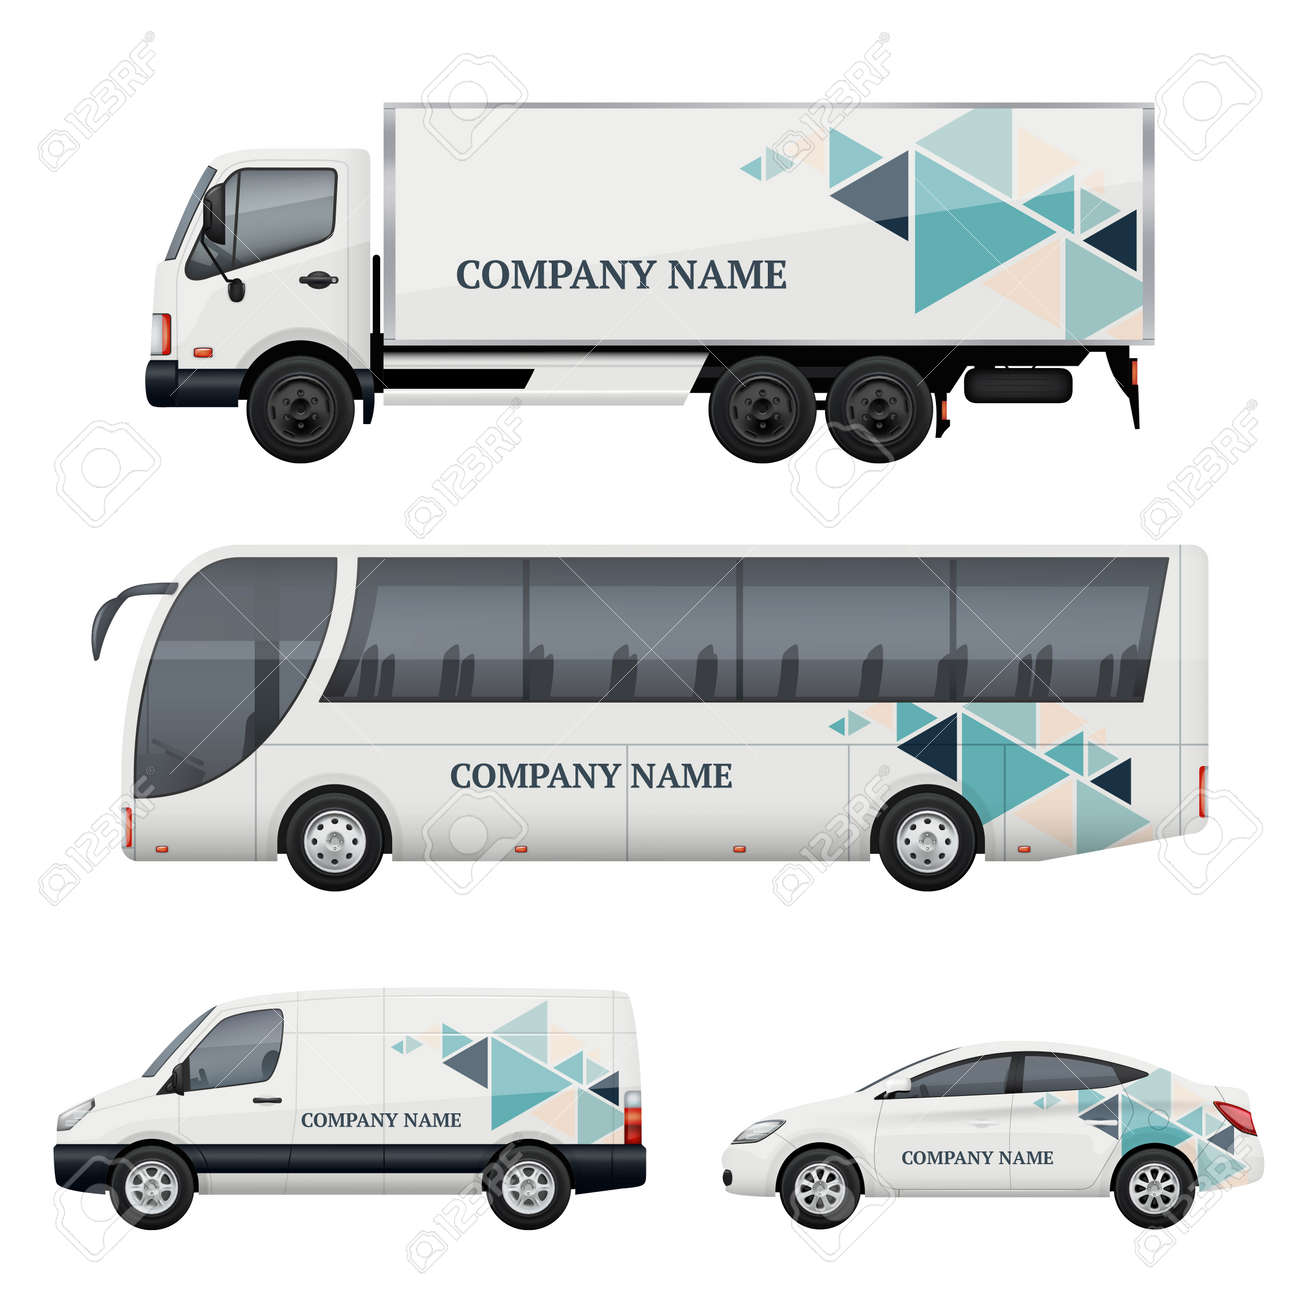 Vehicle branding. Transportation advertizing bus truck van car realistic vector mockup. Illustration of bus and van truck, vehicle car transport - 168206921